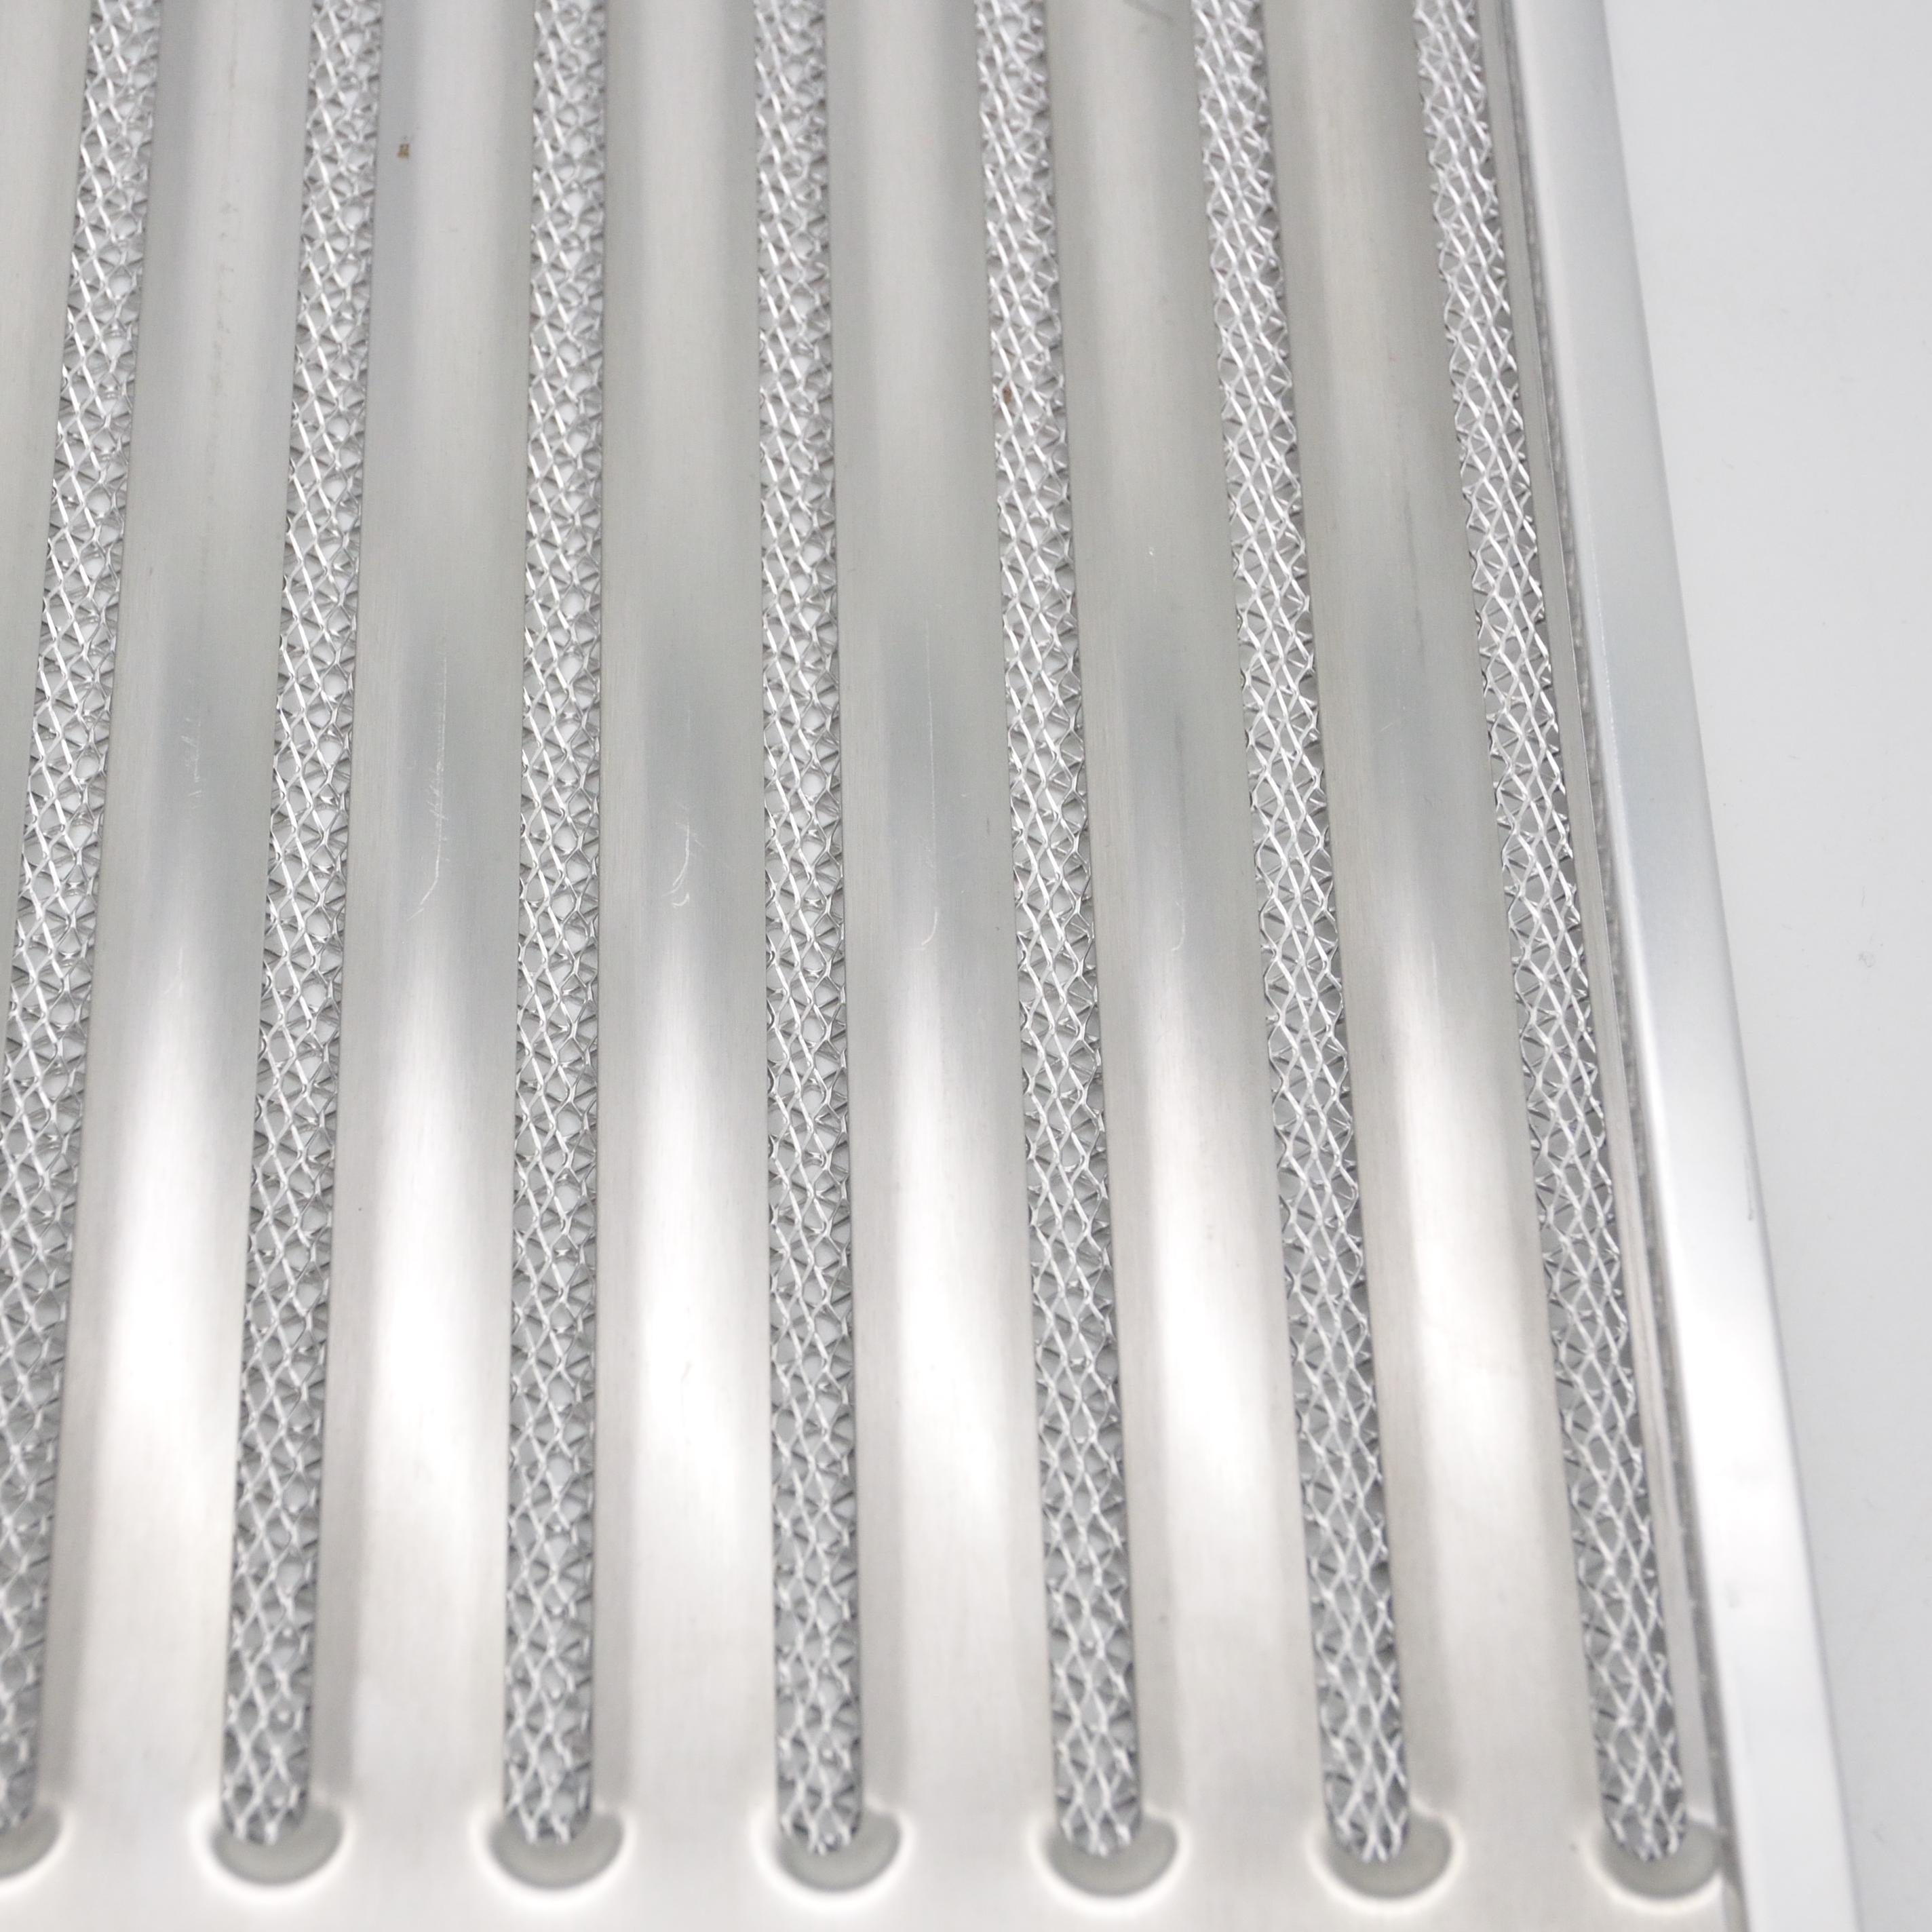 Washable High Efficiency Cooker Hood Stainless Steel Range Hood Grease Filter For Cooker Hood